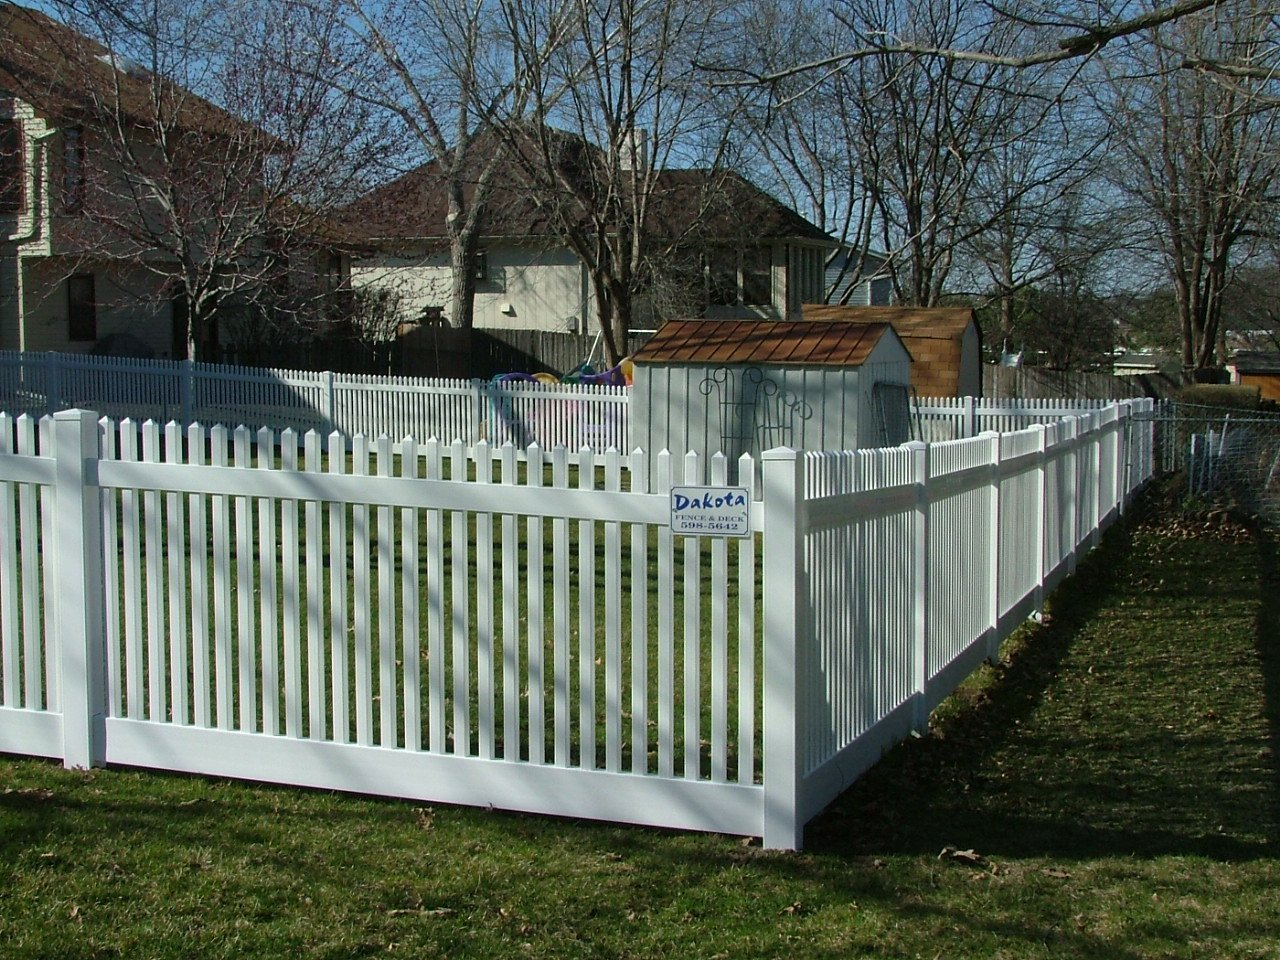 Dakota Fence & Deck 4' white pvc picket with 1.5 x 1.5  pickets - Omaha and Papillion, Nebraska